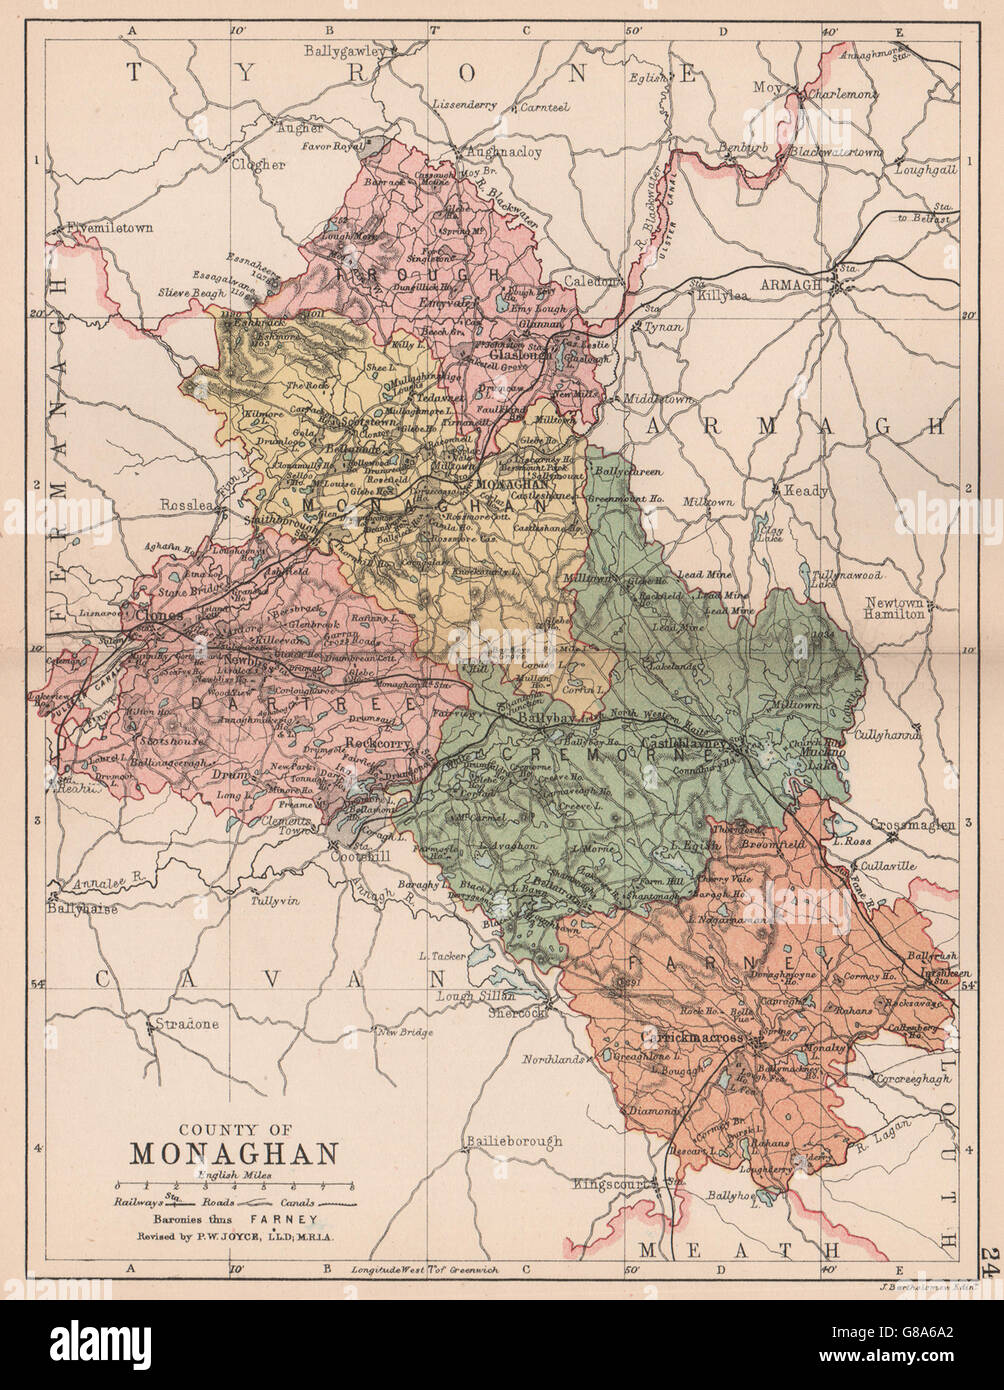 County Monaghan Antique County Map Ulster Ireland Bartholomew